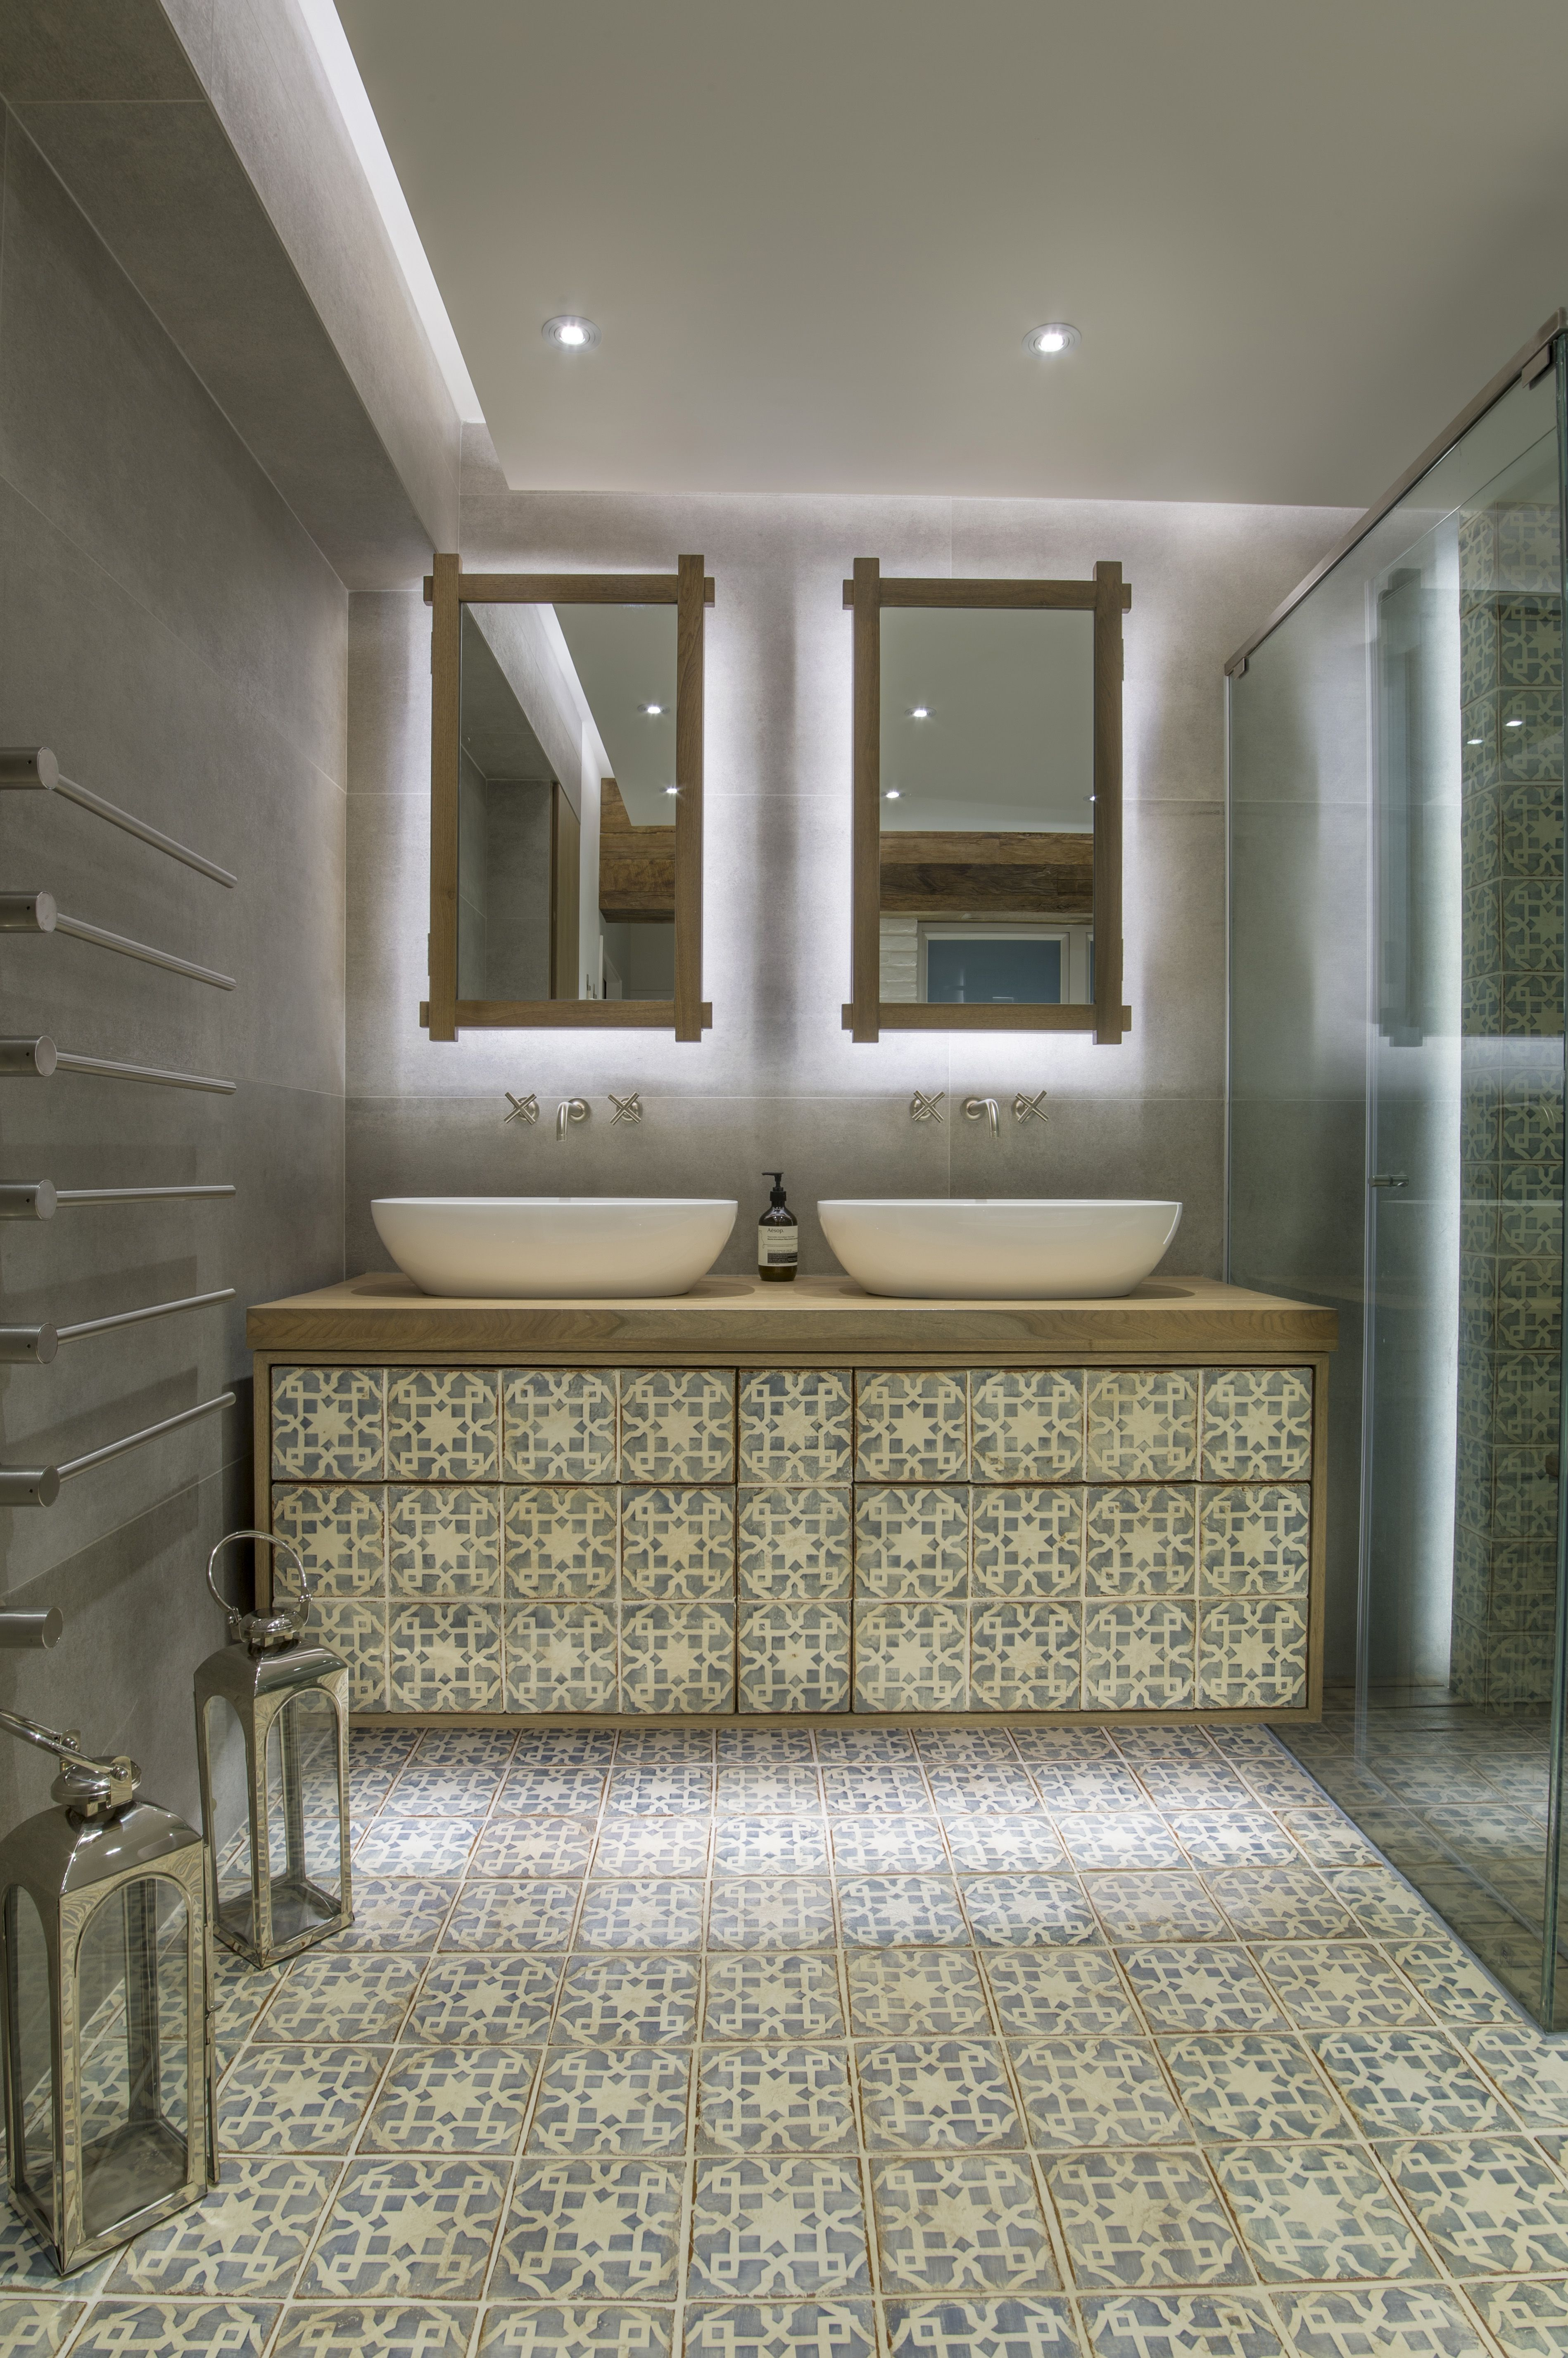 Bathroom moroccan style - Master Bathroom Moroccan Inspired Room Fired Earth Tiles Sanitary From Kohler